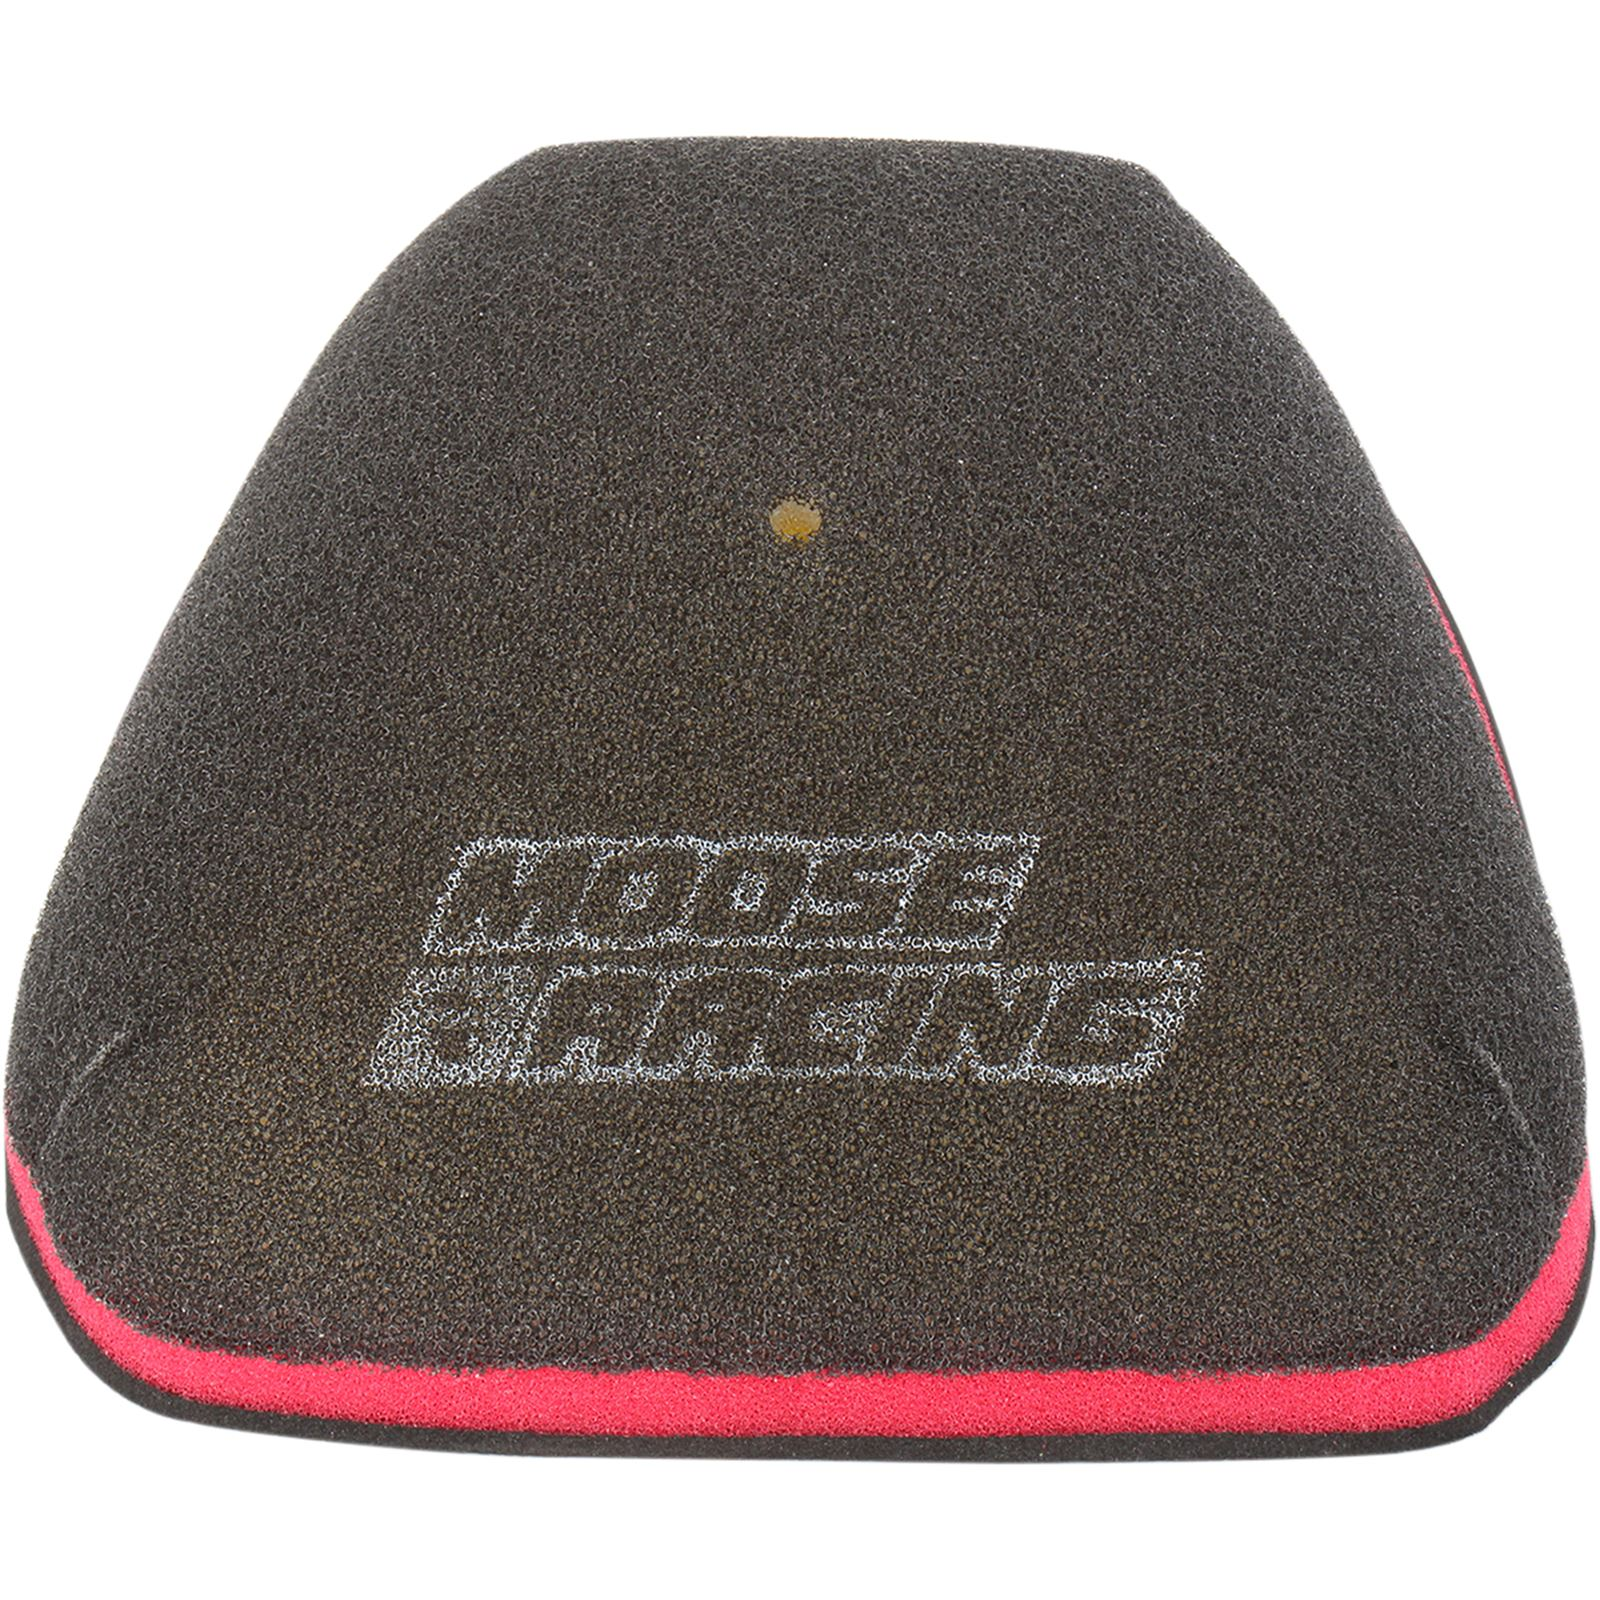 Moose Racing Air Filter Triple Foam Yamaha